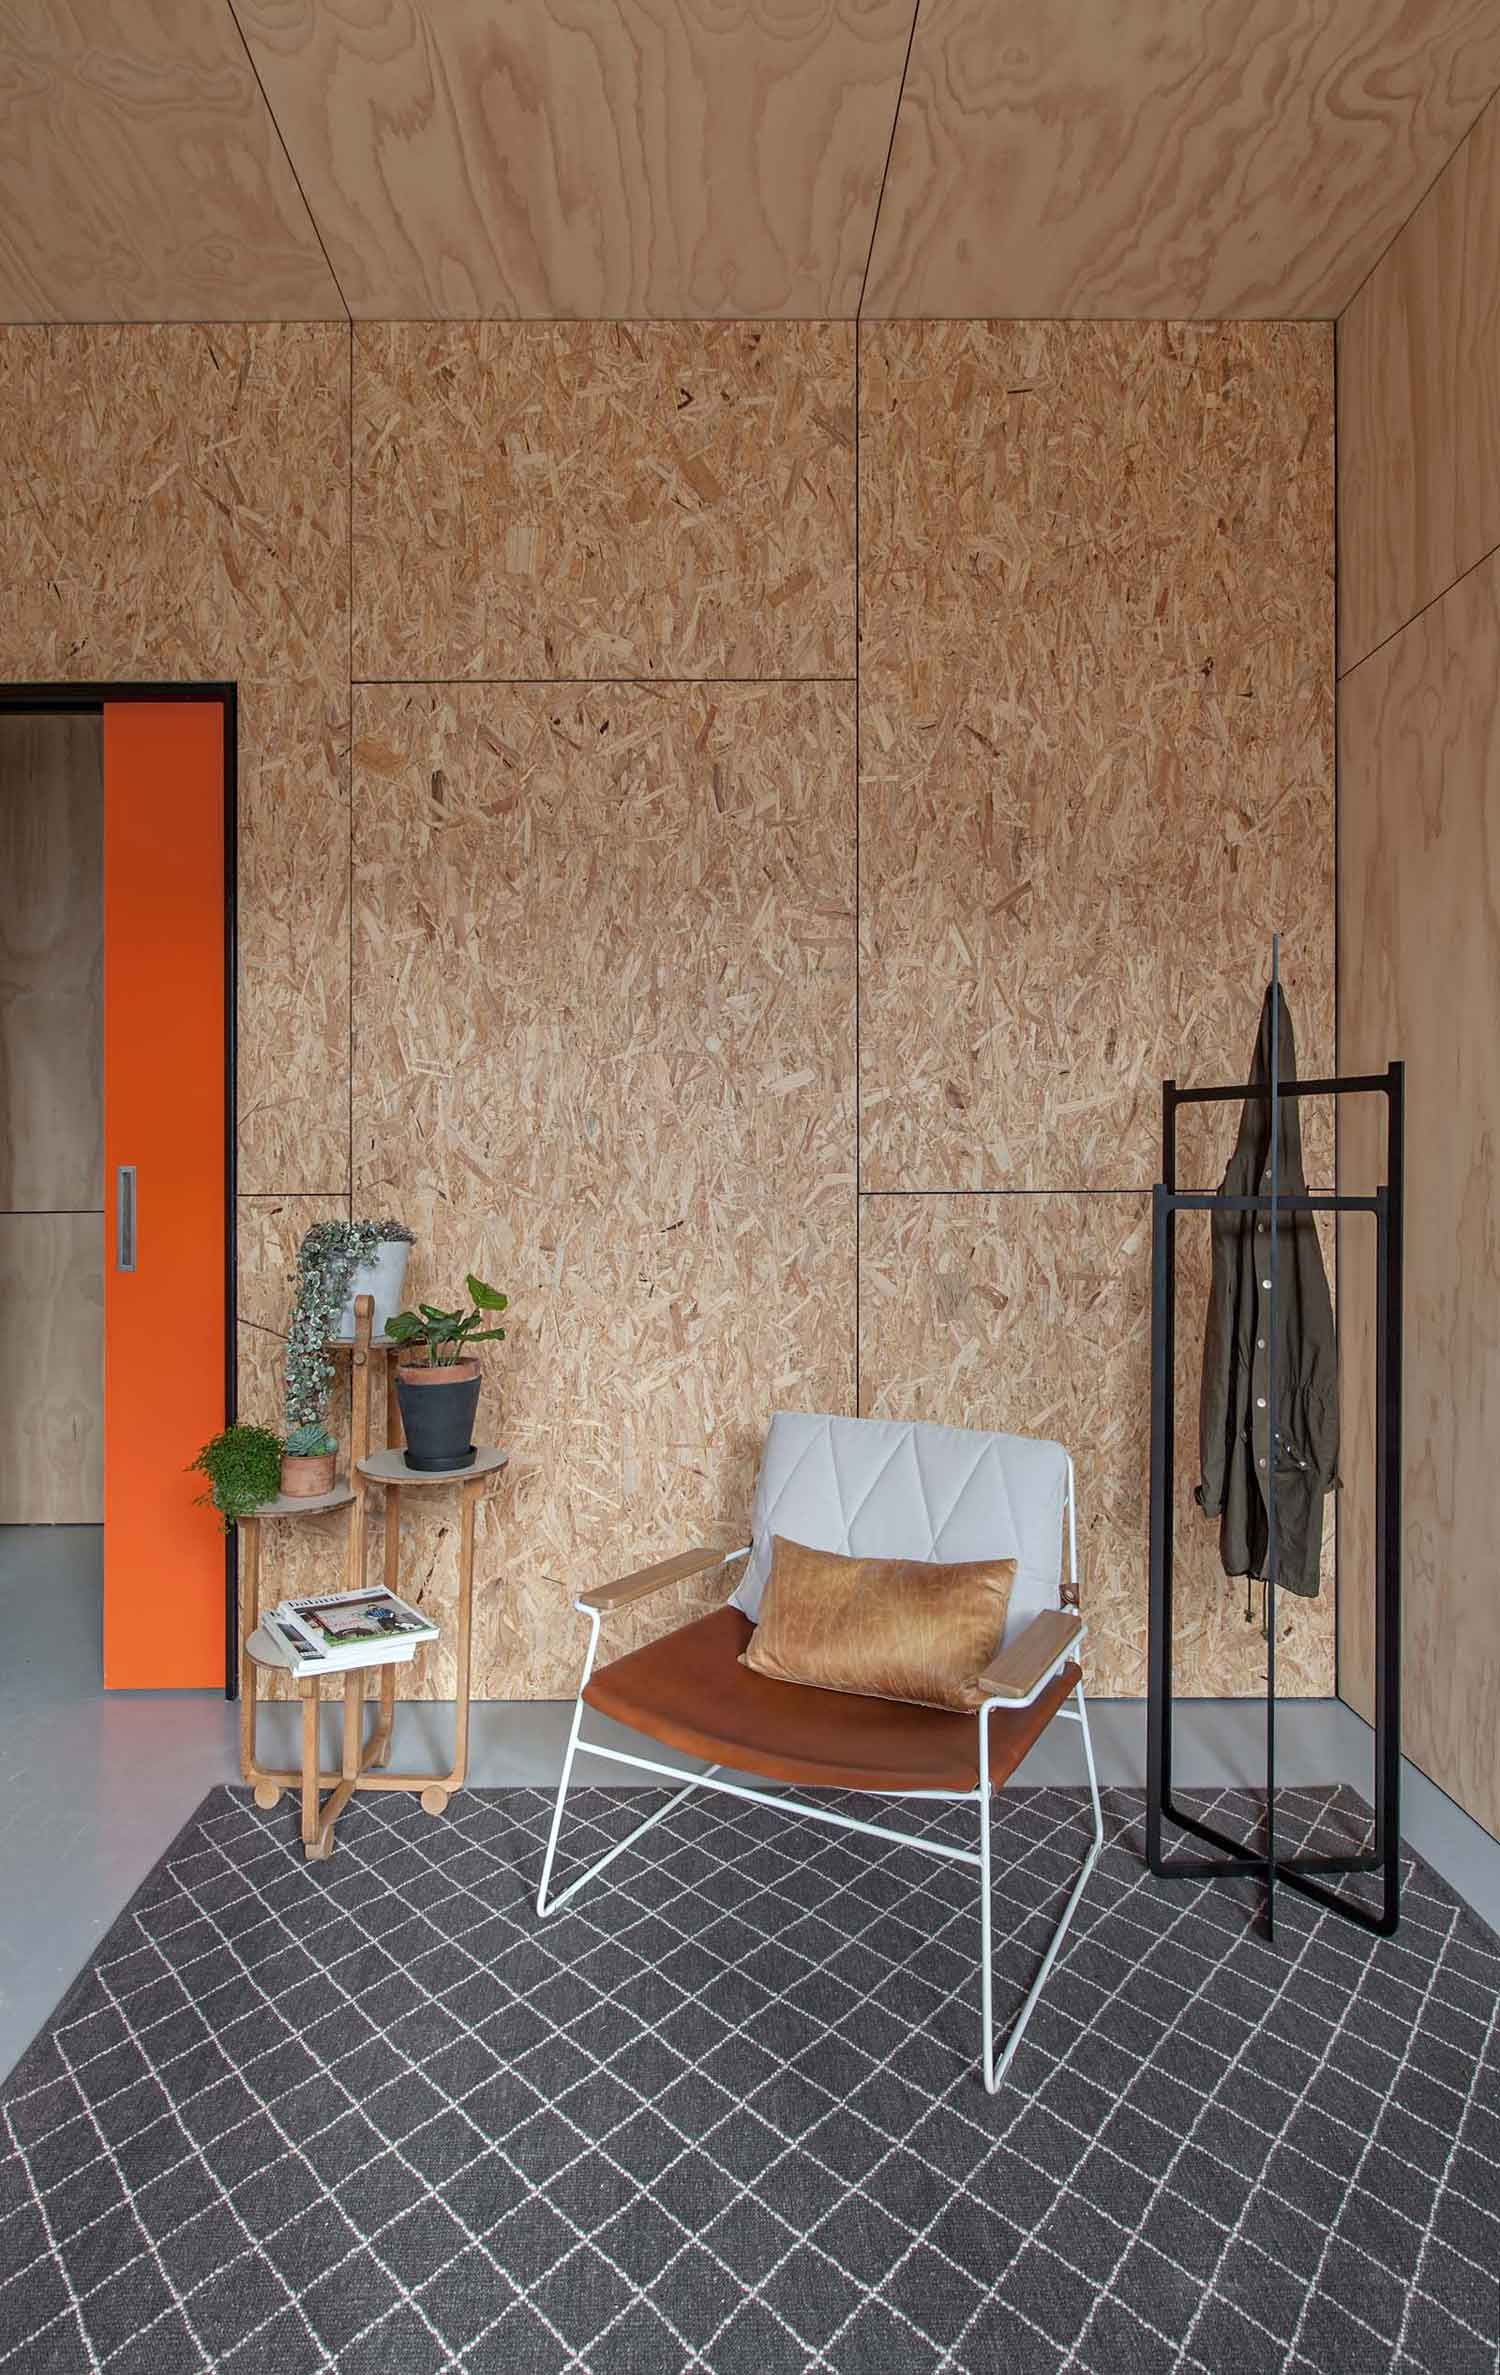 Id Es D Co Habiller Ses Murs De Bois Warehouse Studio And Doors # Muebles De Pino Taeda